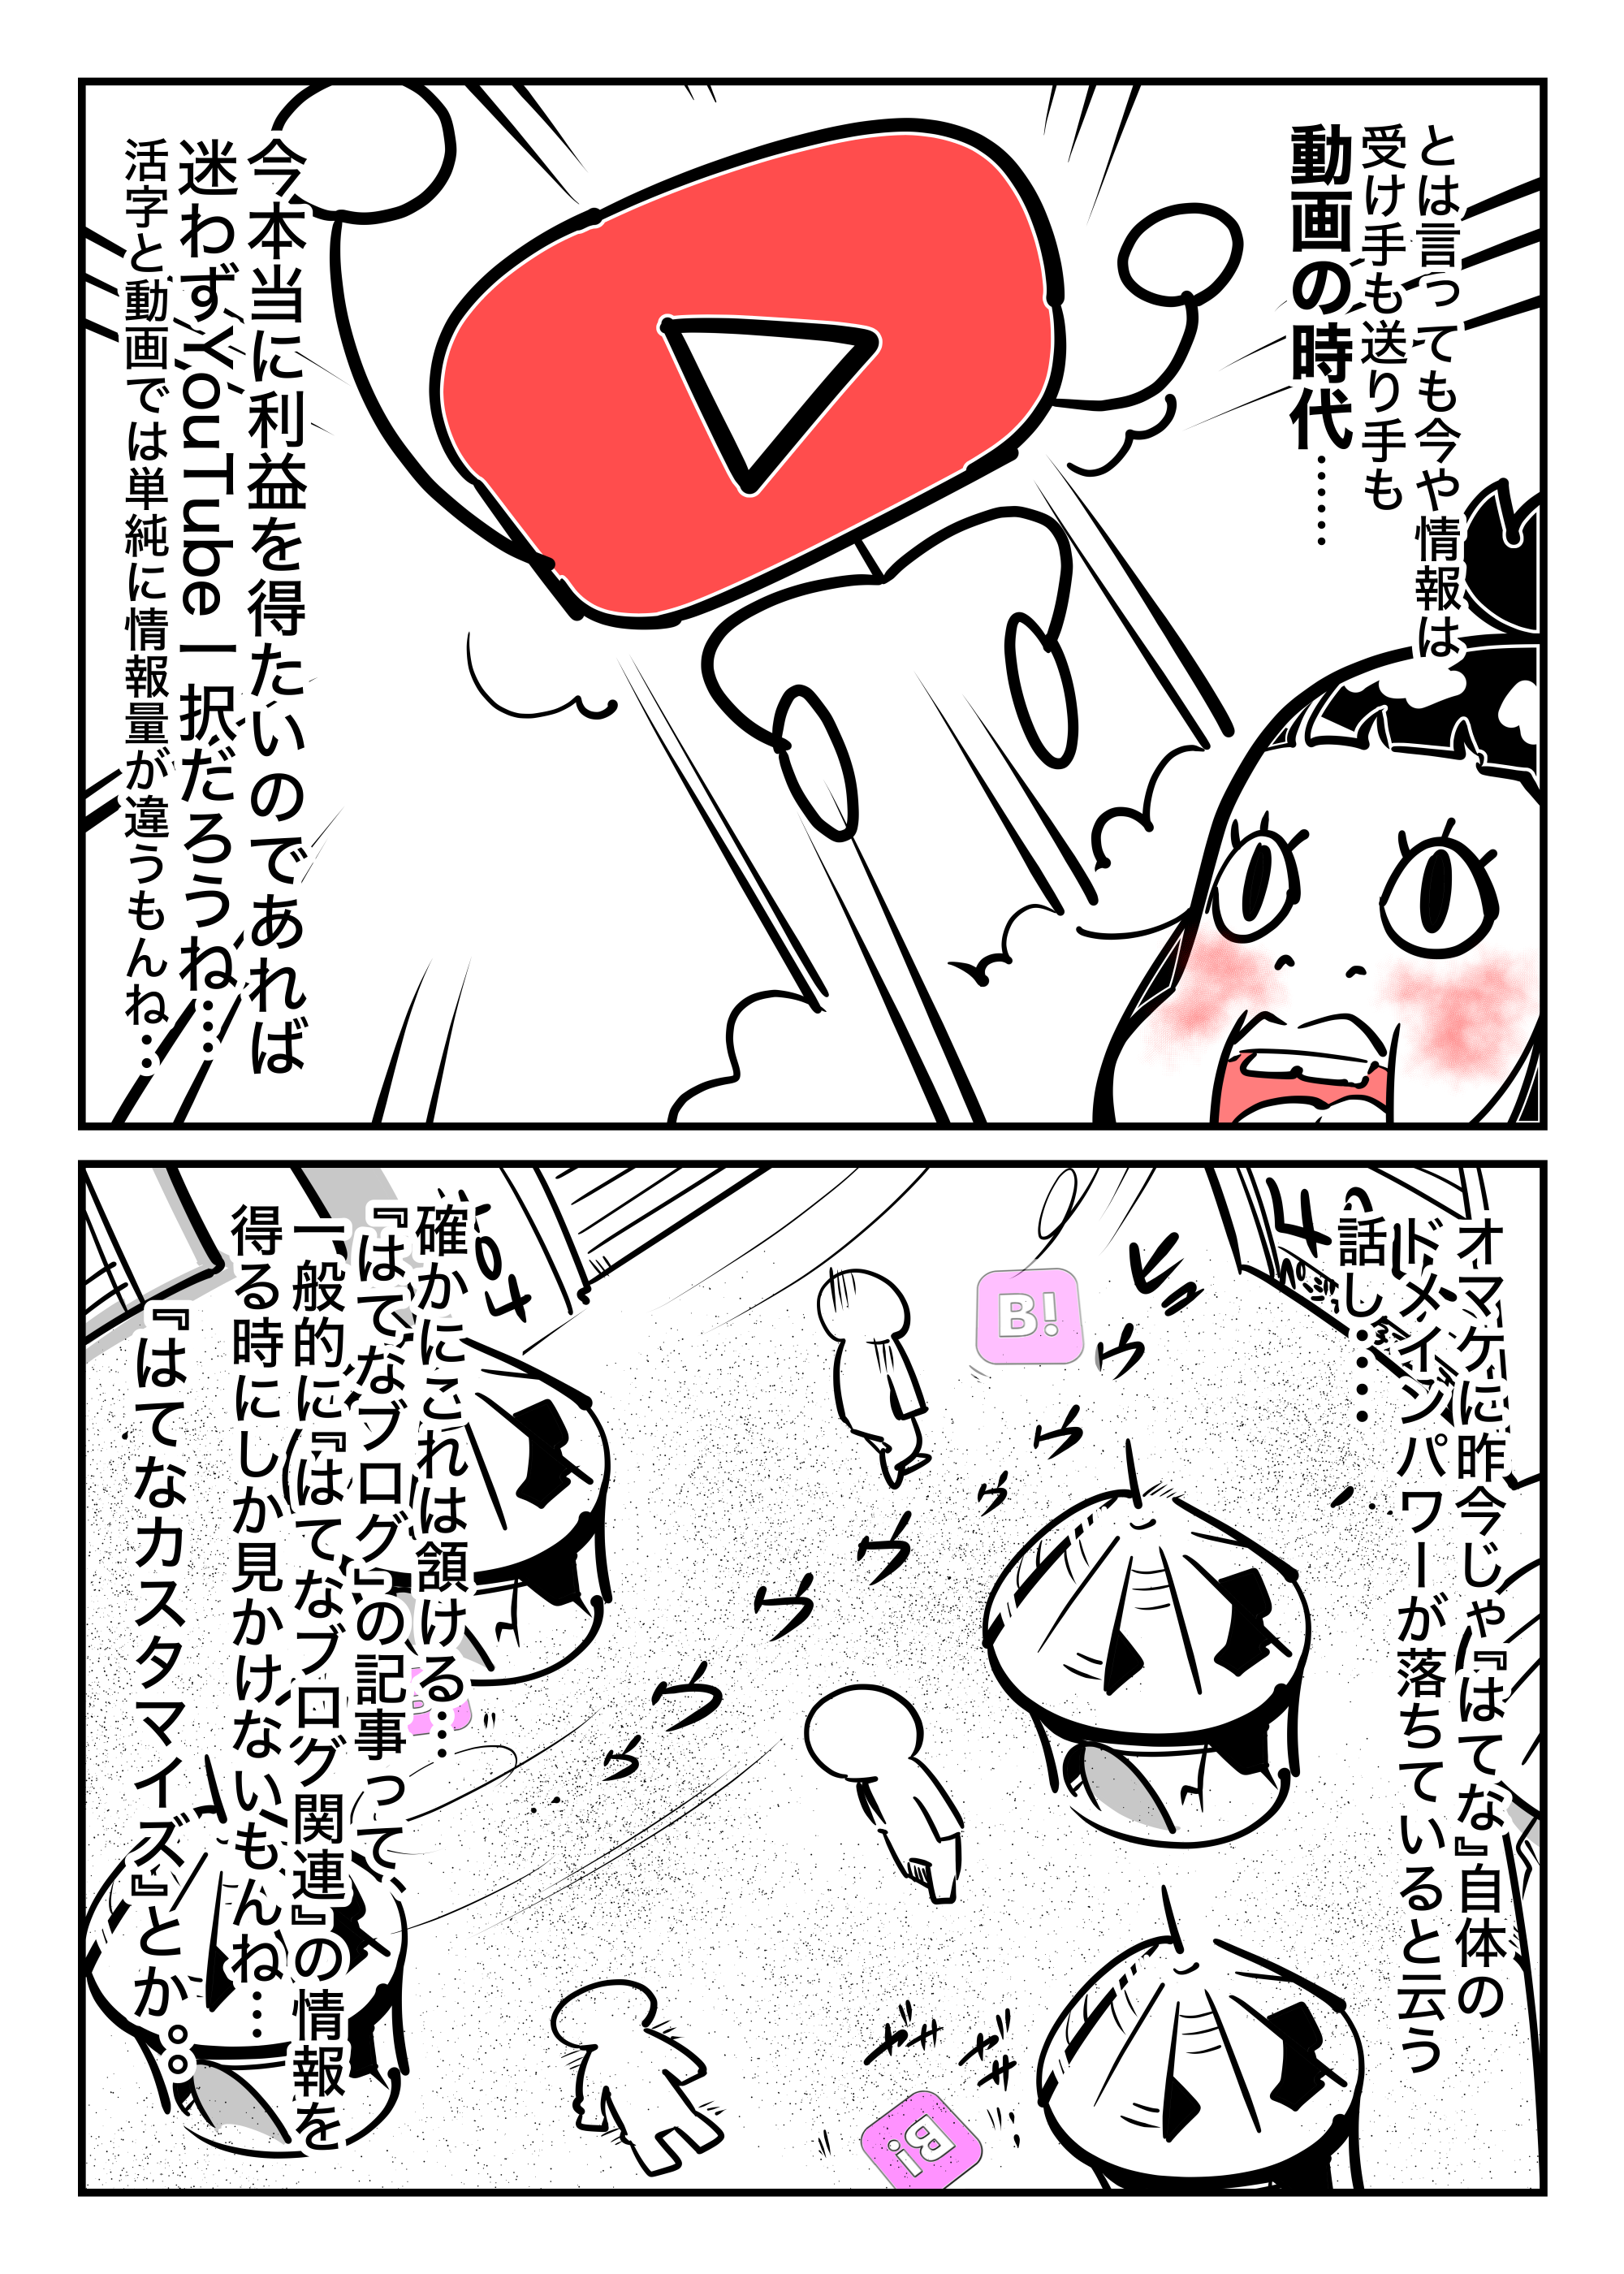 f:id:terashimaru117:20210912183657p:plain